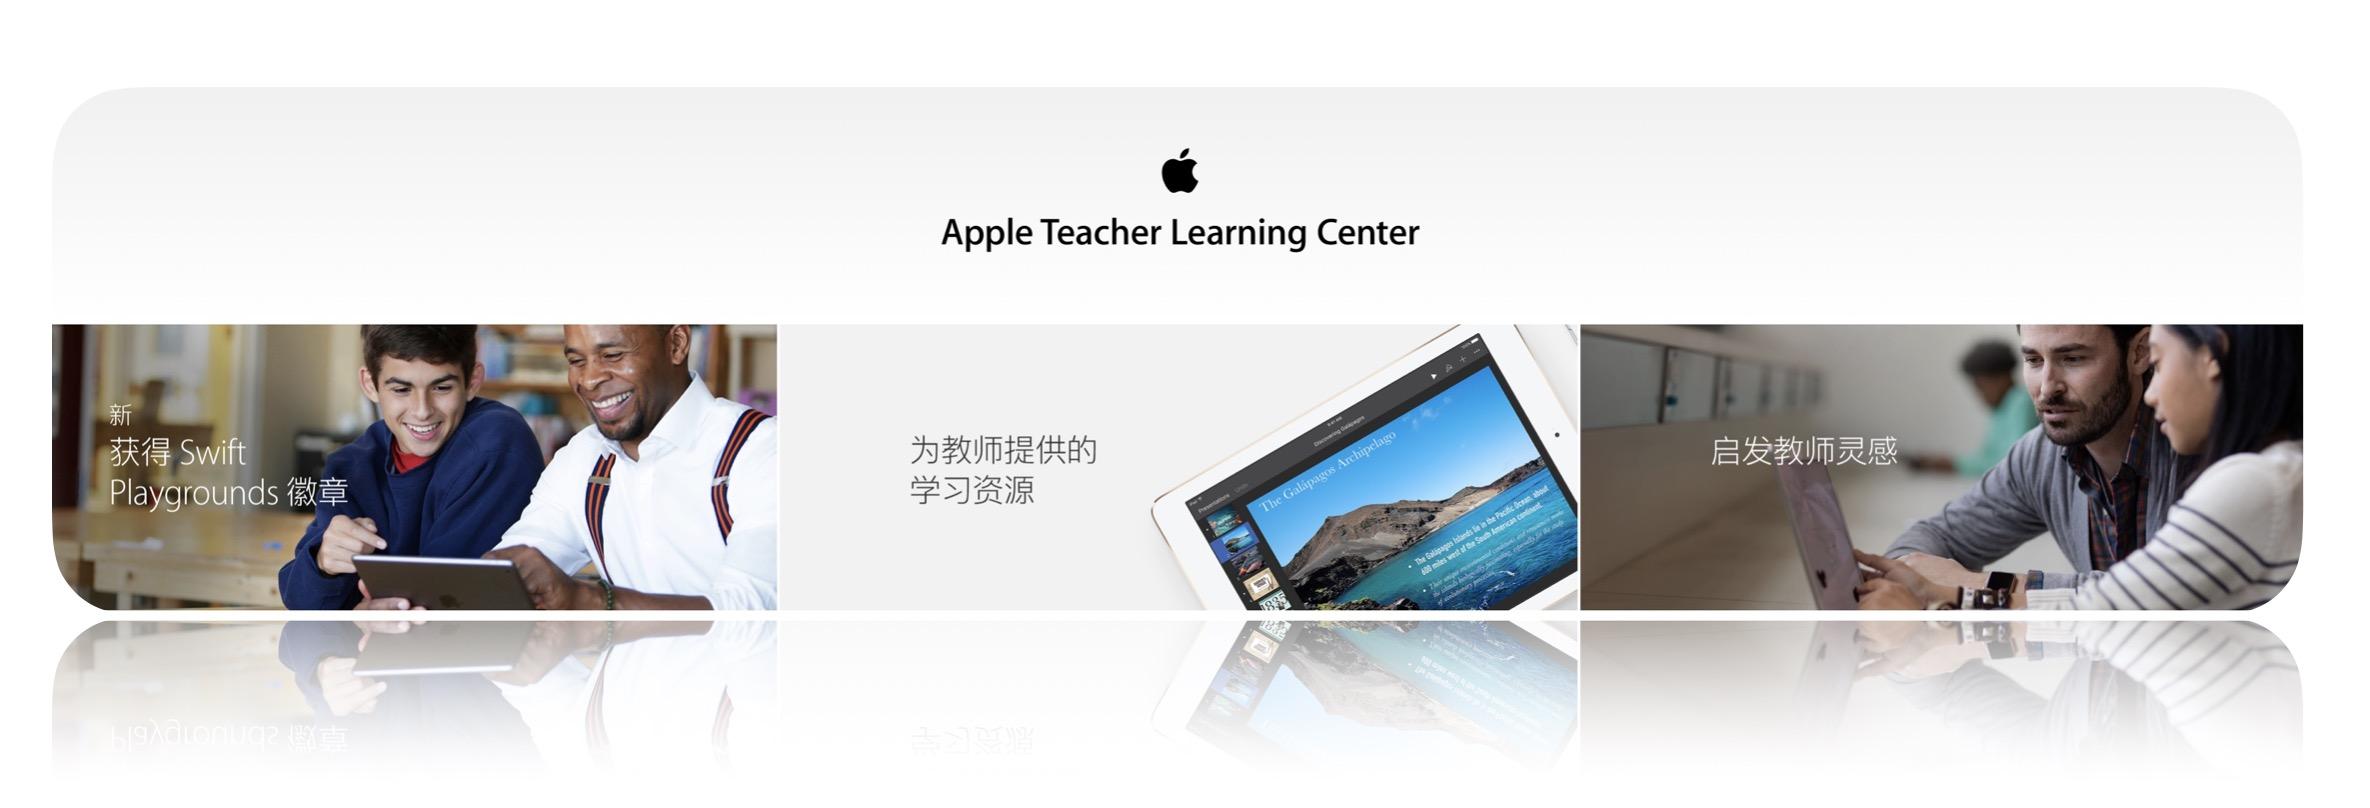 Apple Teacher 学习中心